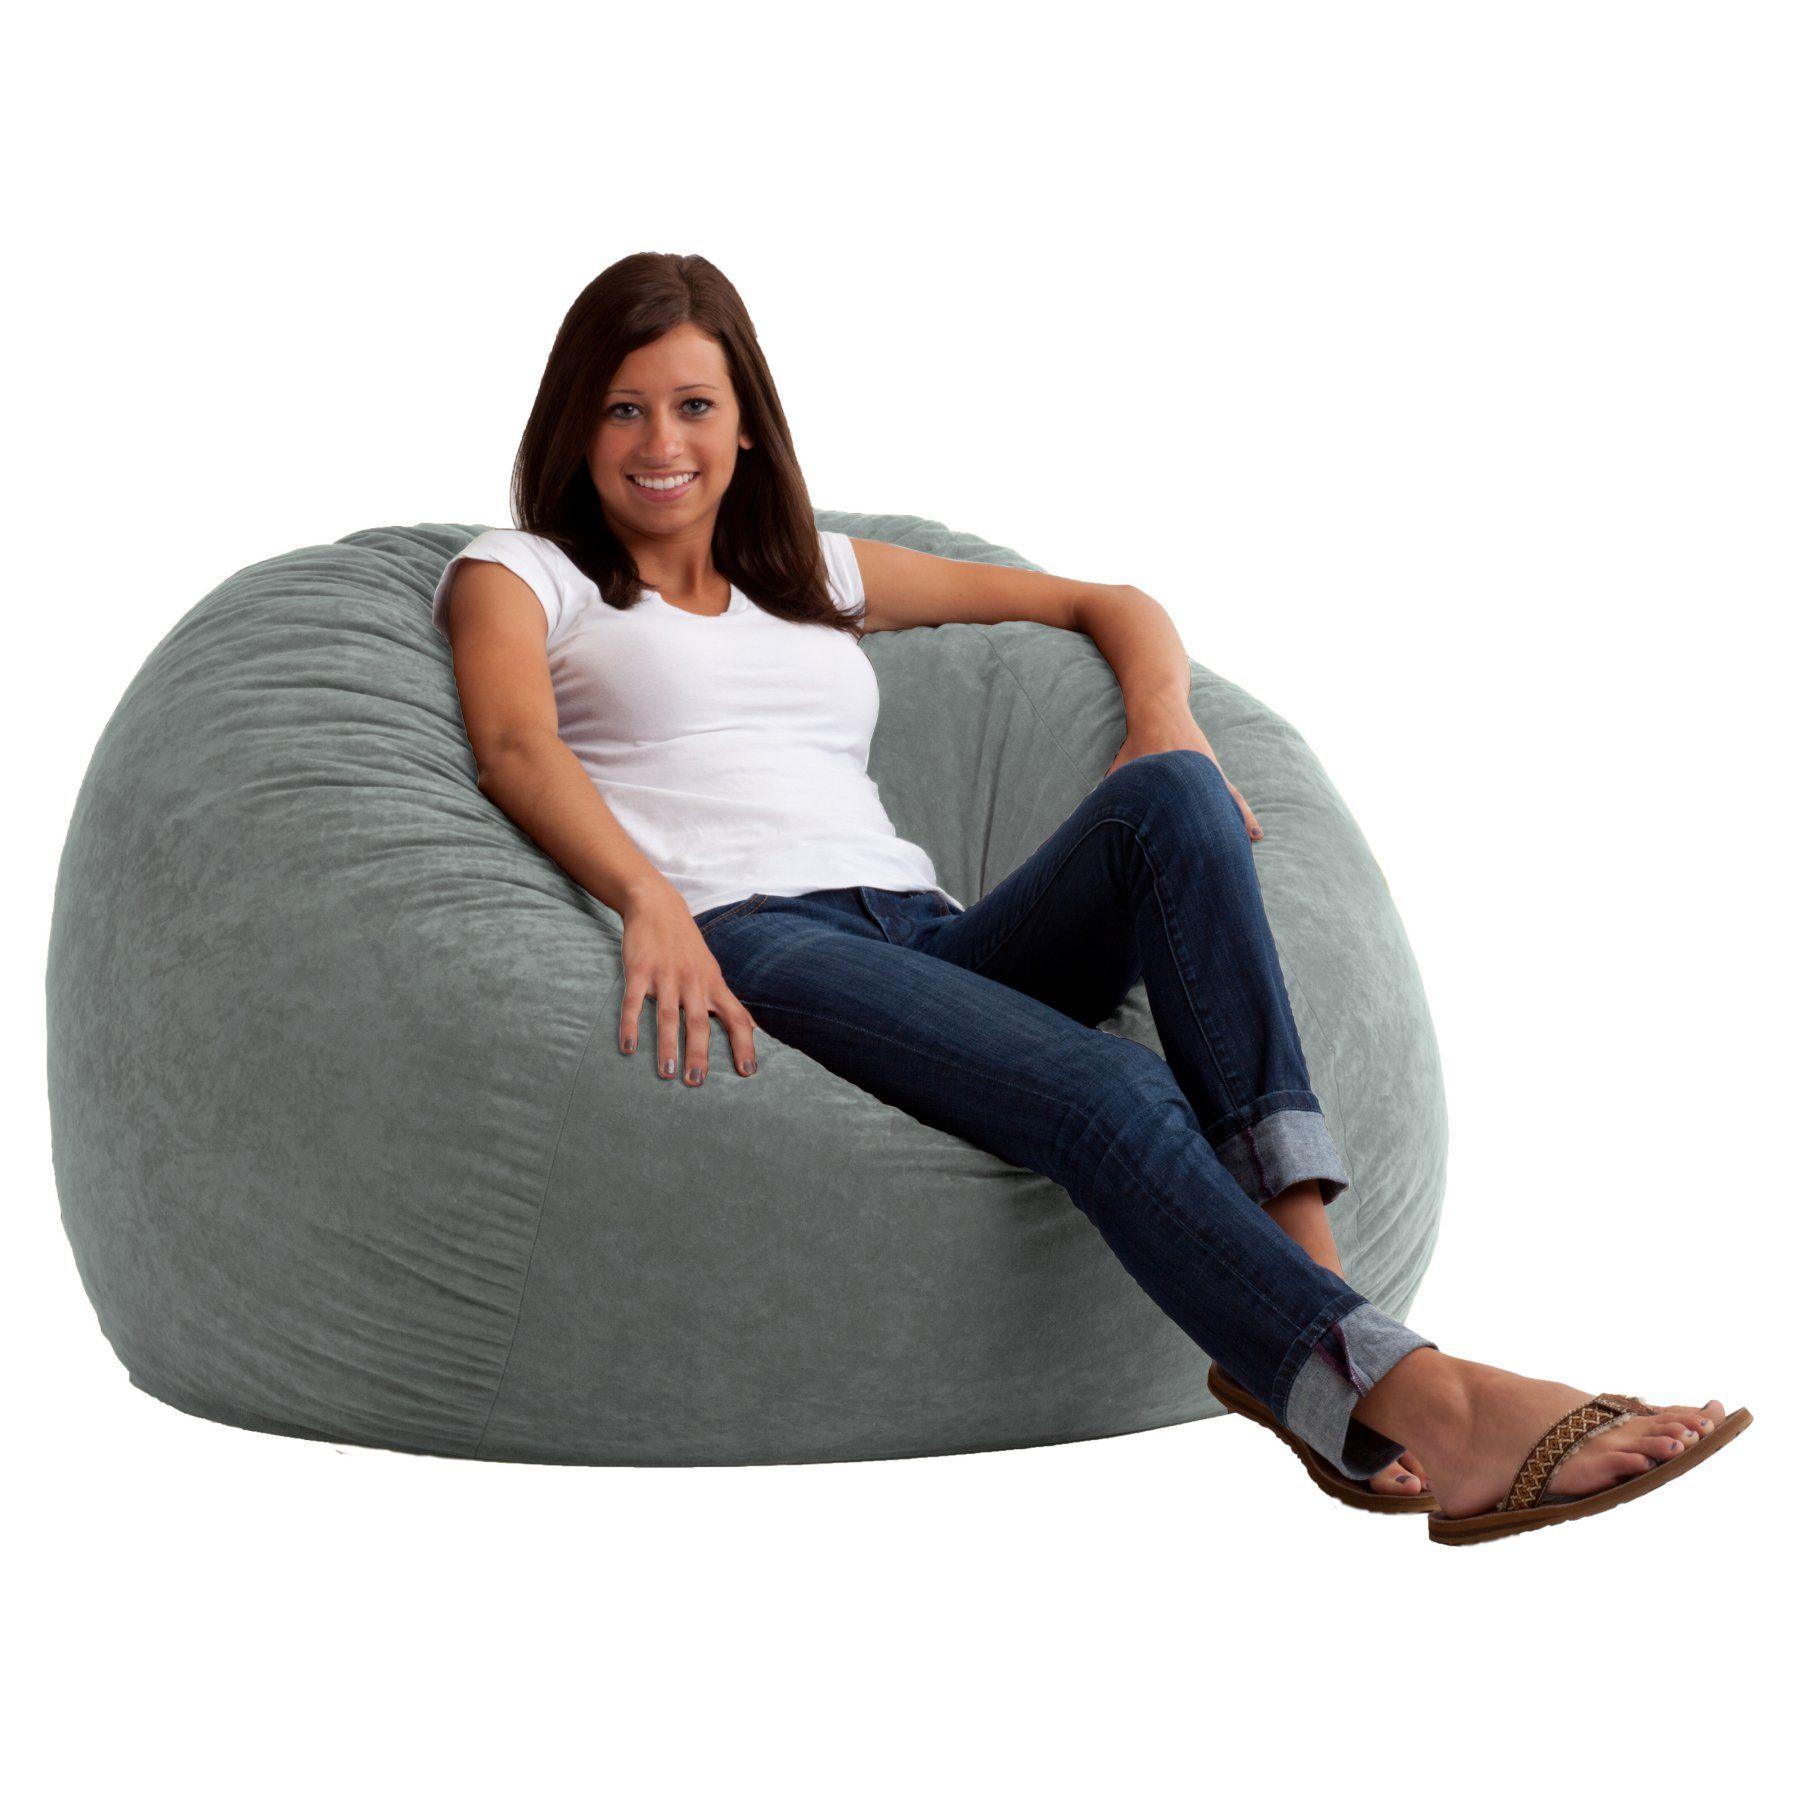 Brilliant Fuf 4 Ft Large Comfort Suede Bean Bag Lounger 0010176 Dailytribune Chair Design For Home Dailytribuneorg